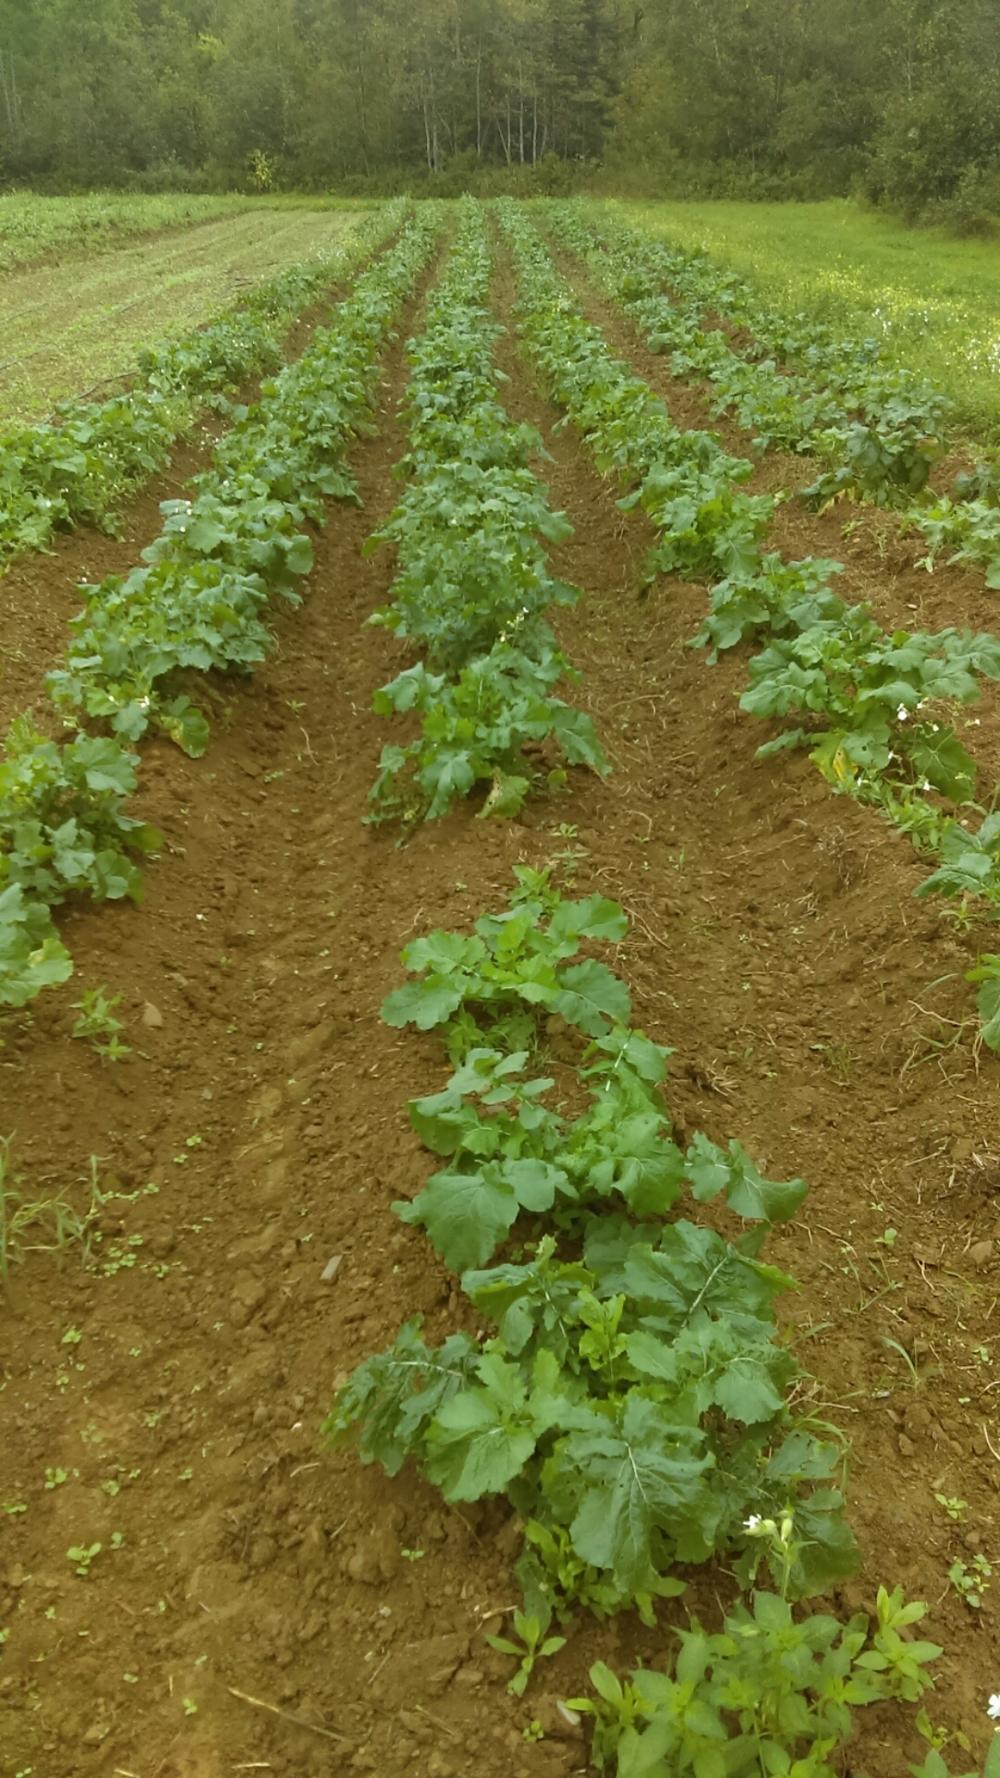 Turnip Soaking in the last few weeks of summer warmth